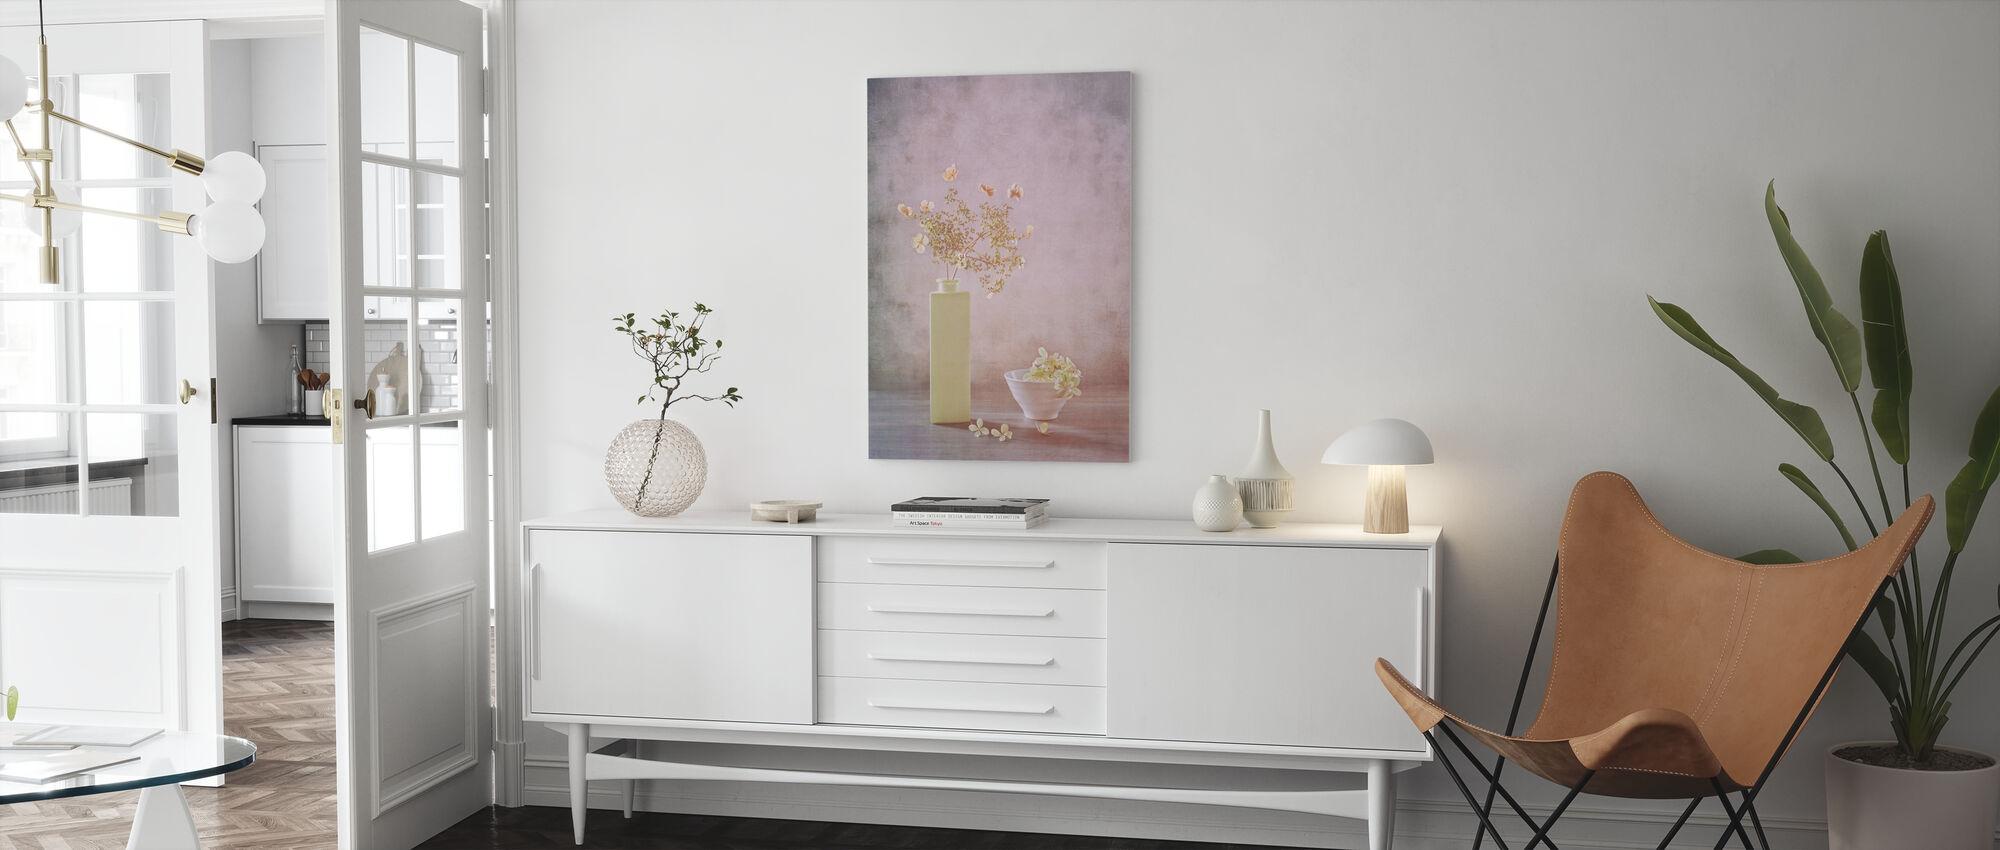 Morning Light - Canvas print - Living Room